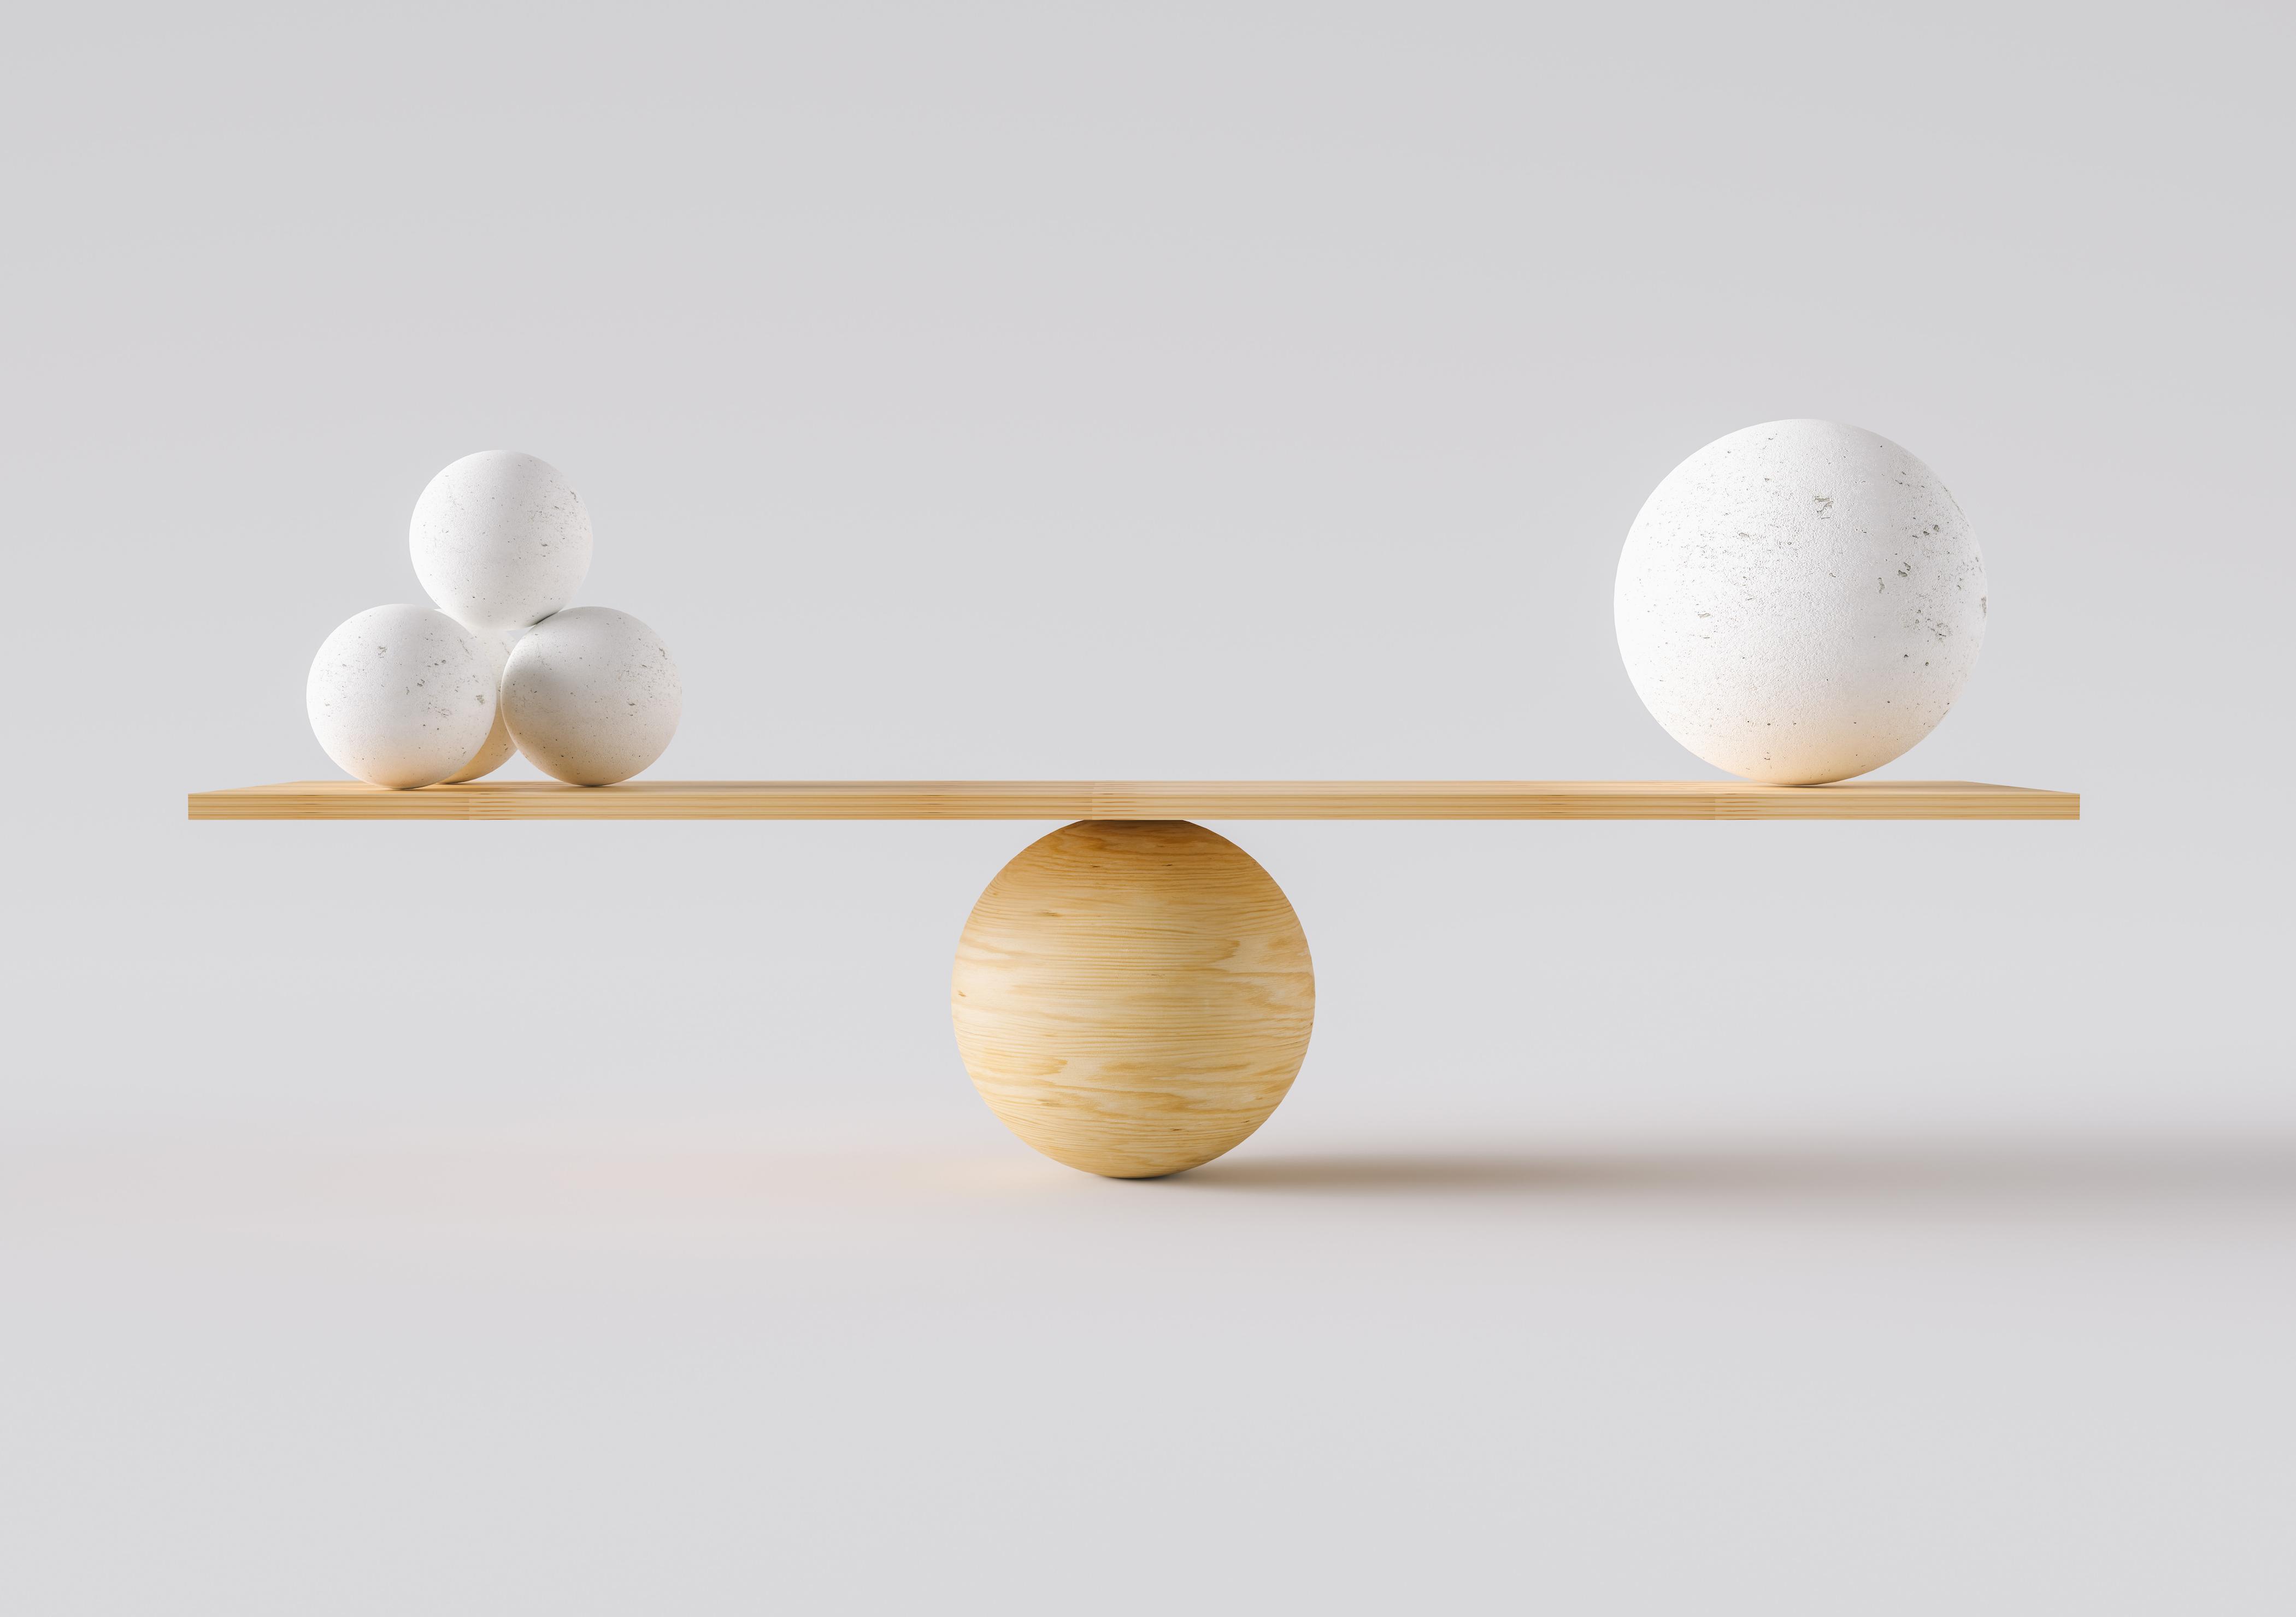 Harmony and balance concept